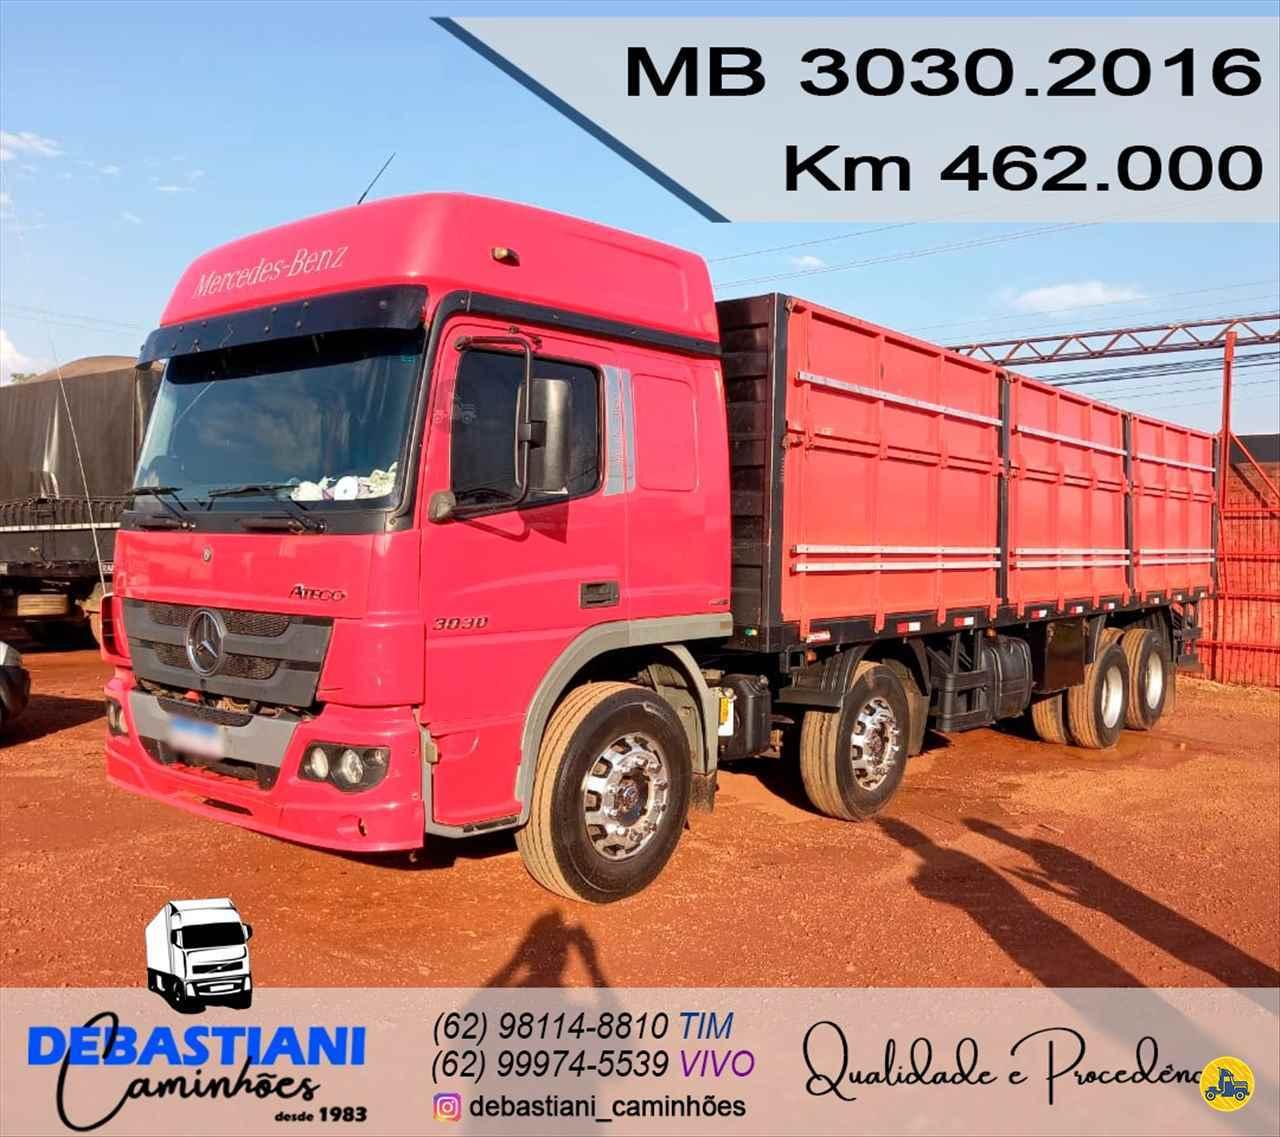 CAMINHAO MERCEDES-BENZ MB 3030 Graneleiro BiTruck 8x2 Debastiani Caminhões ANAPOLIS GOIAS GO